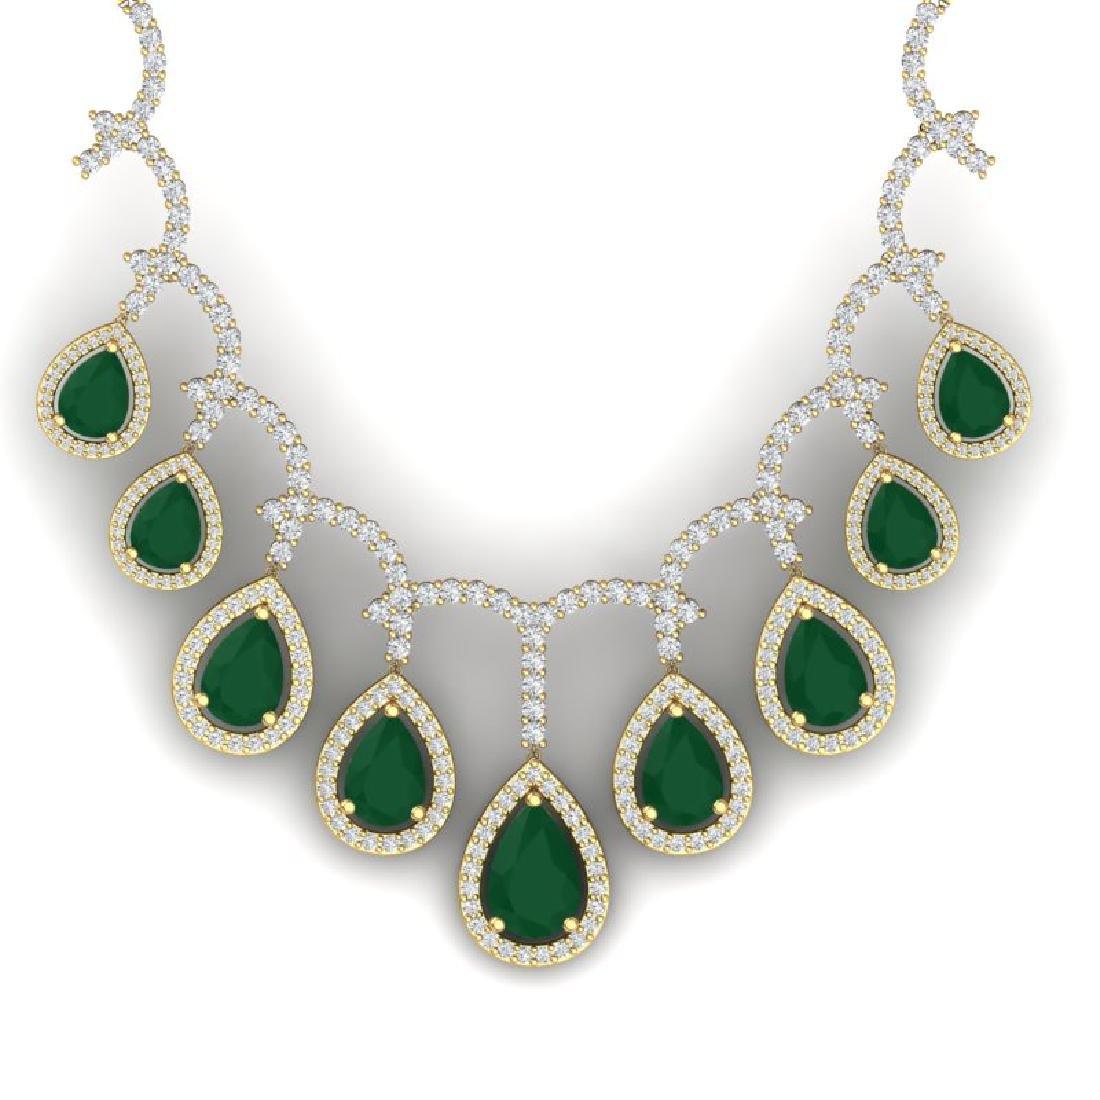 31.5 CTW Royalty Emerald & VS Diamond Necklace 18K